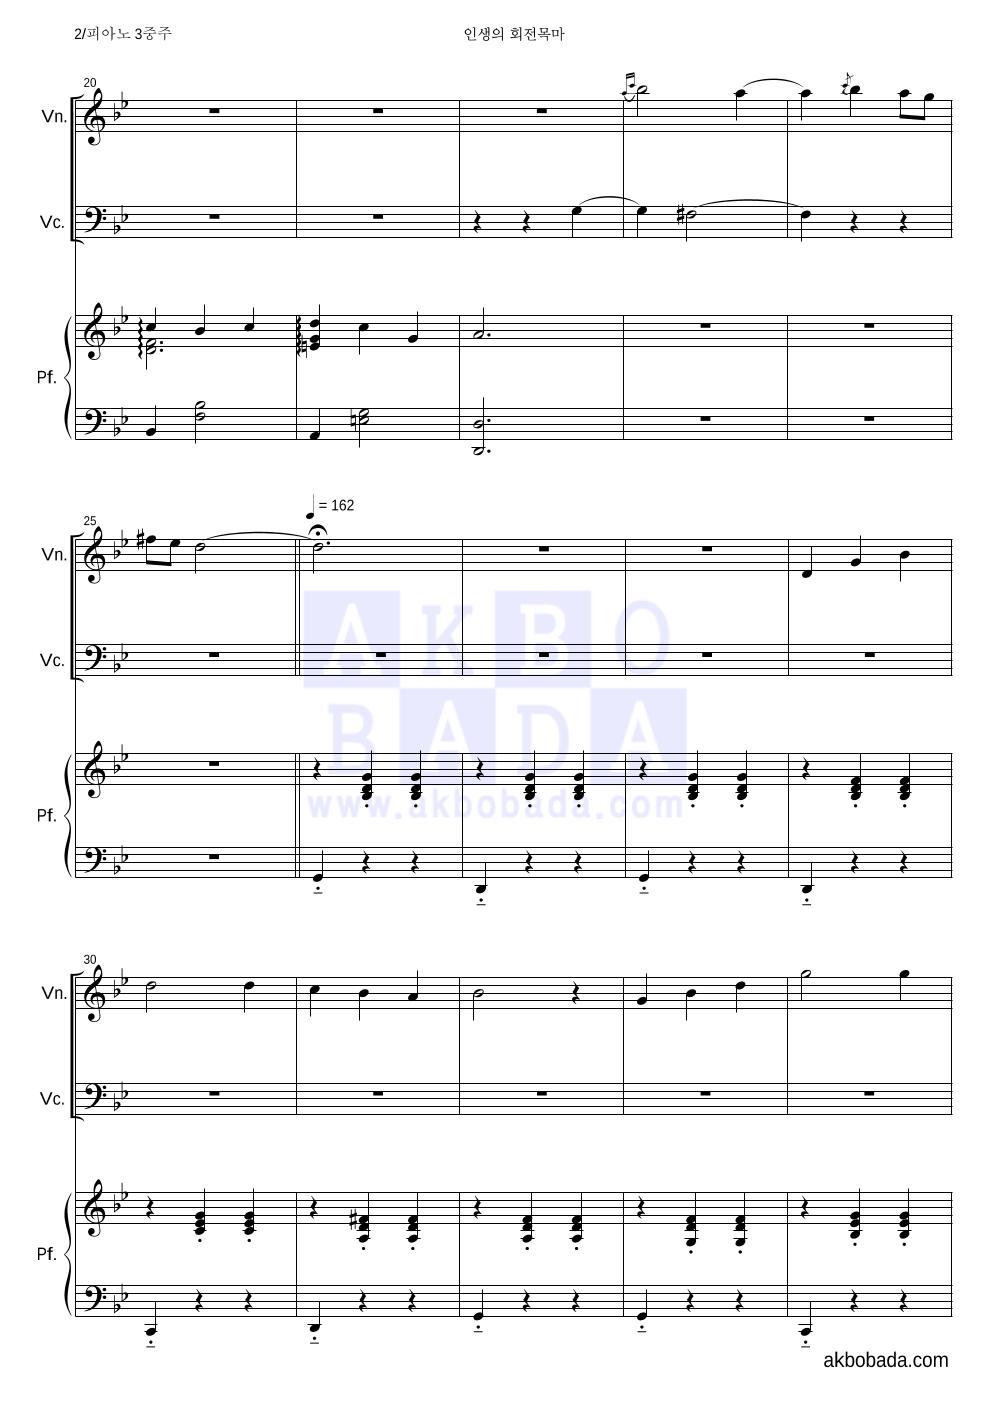 Hisaishi Joe - 인생의 회전목마 피아노3중주 악보